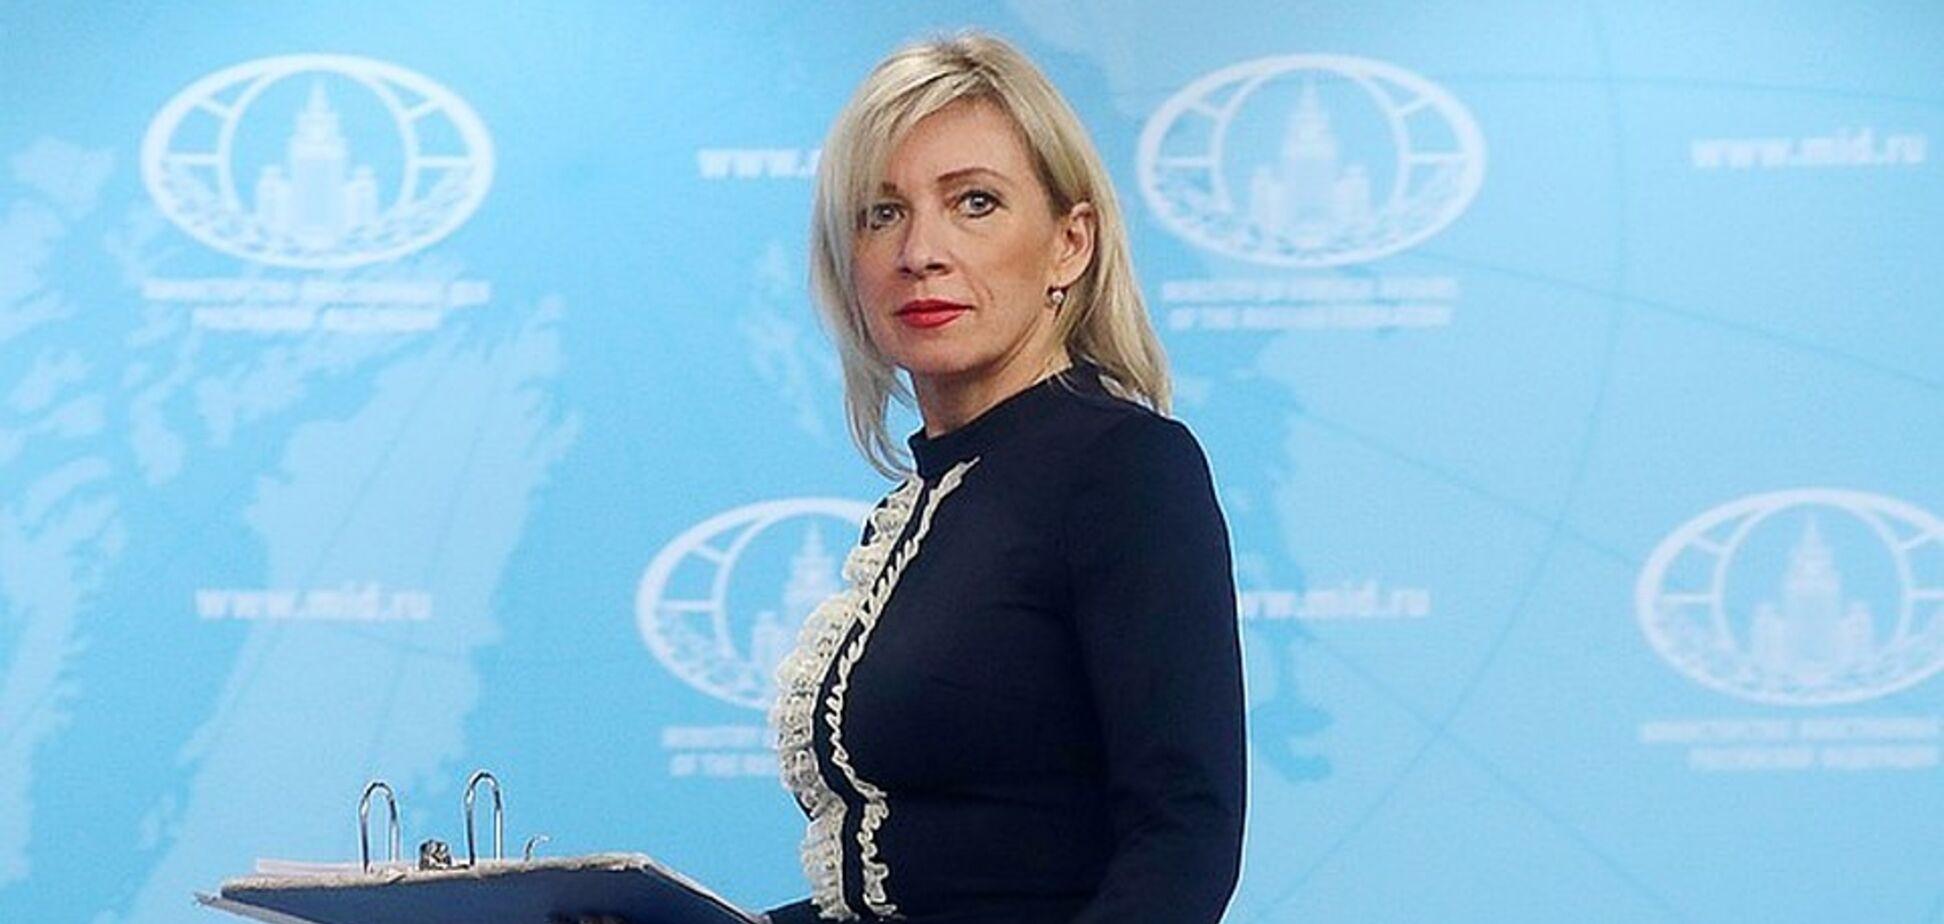 Машу Захарову могут уволить